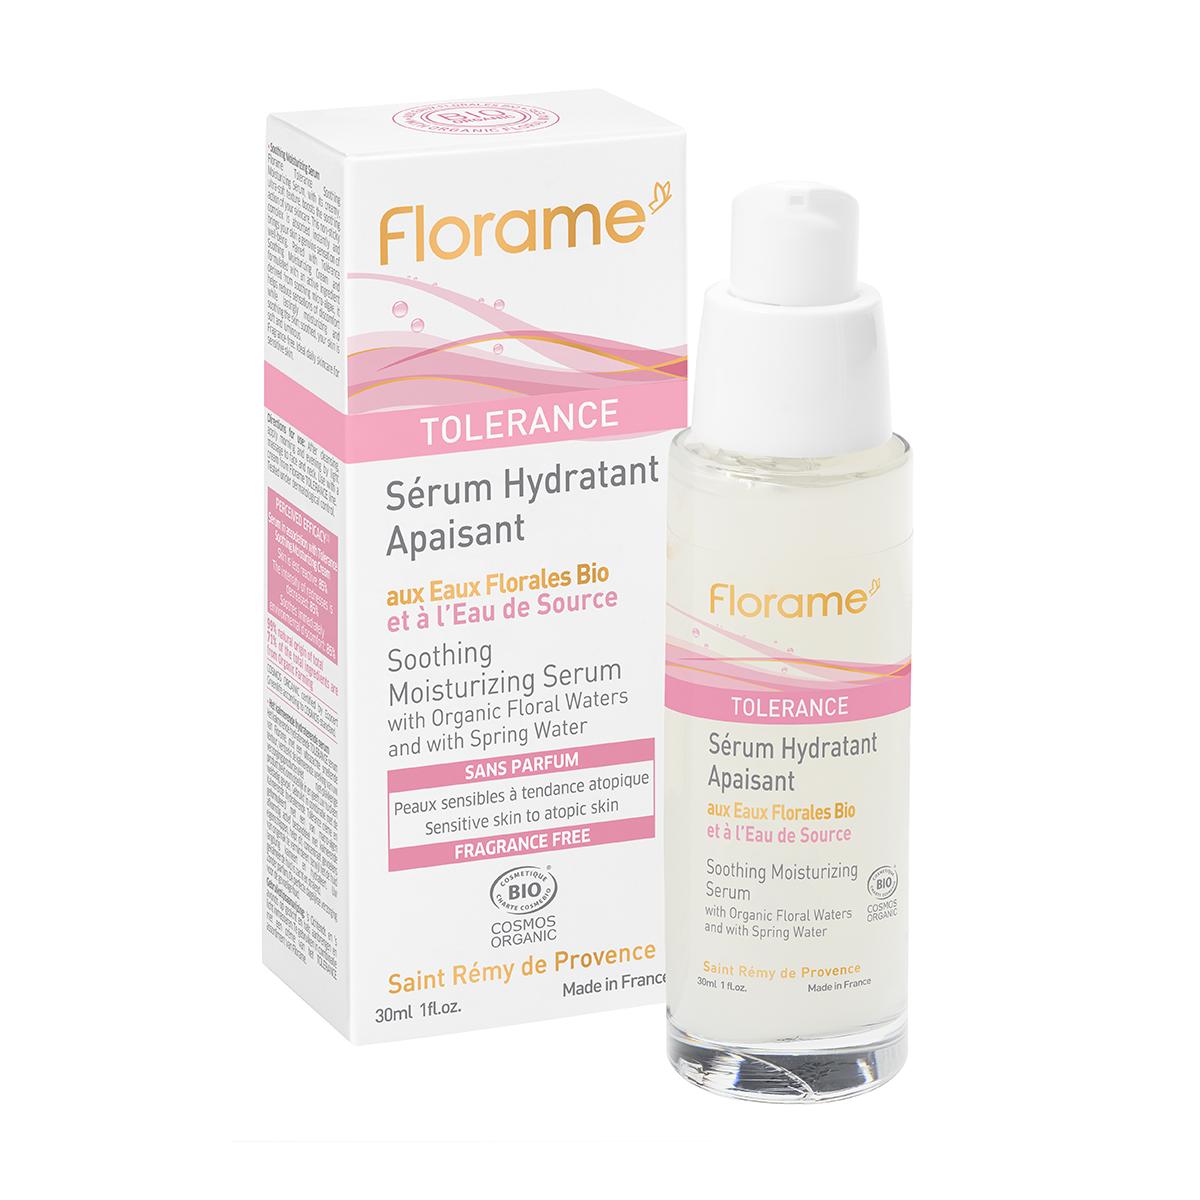 Florame Sérum hydratant apaisant Tolérance